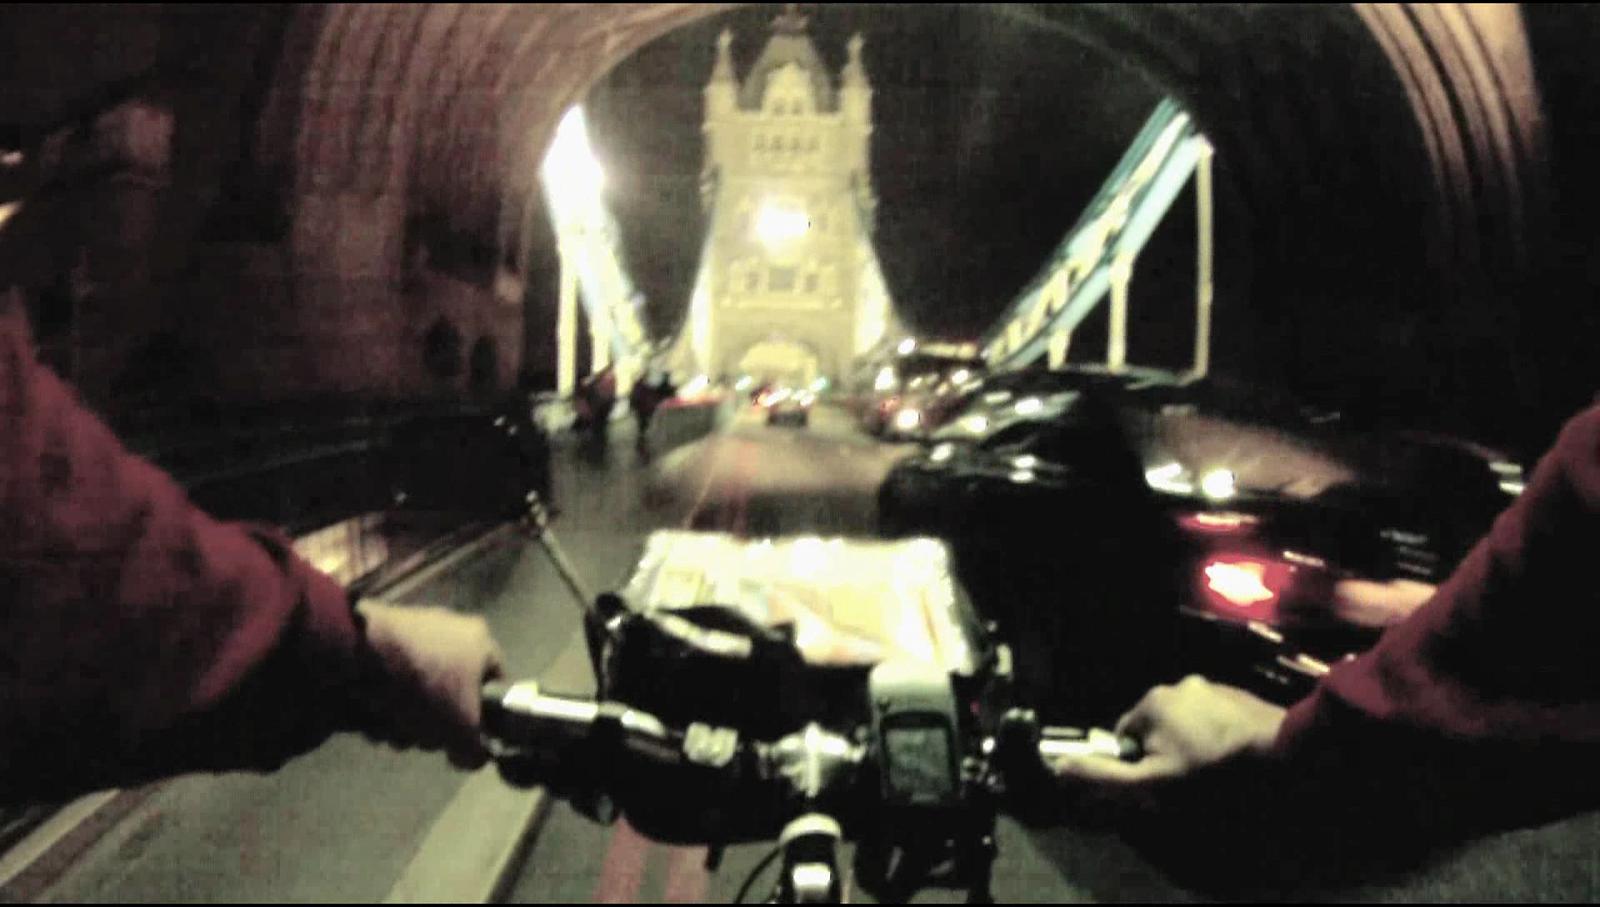 London 2010 - Tower Bridge by night